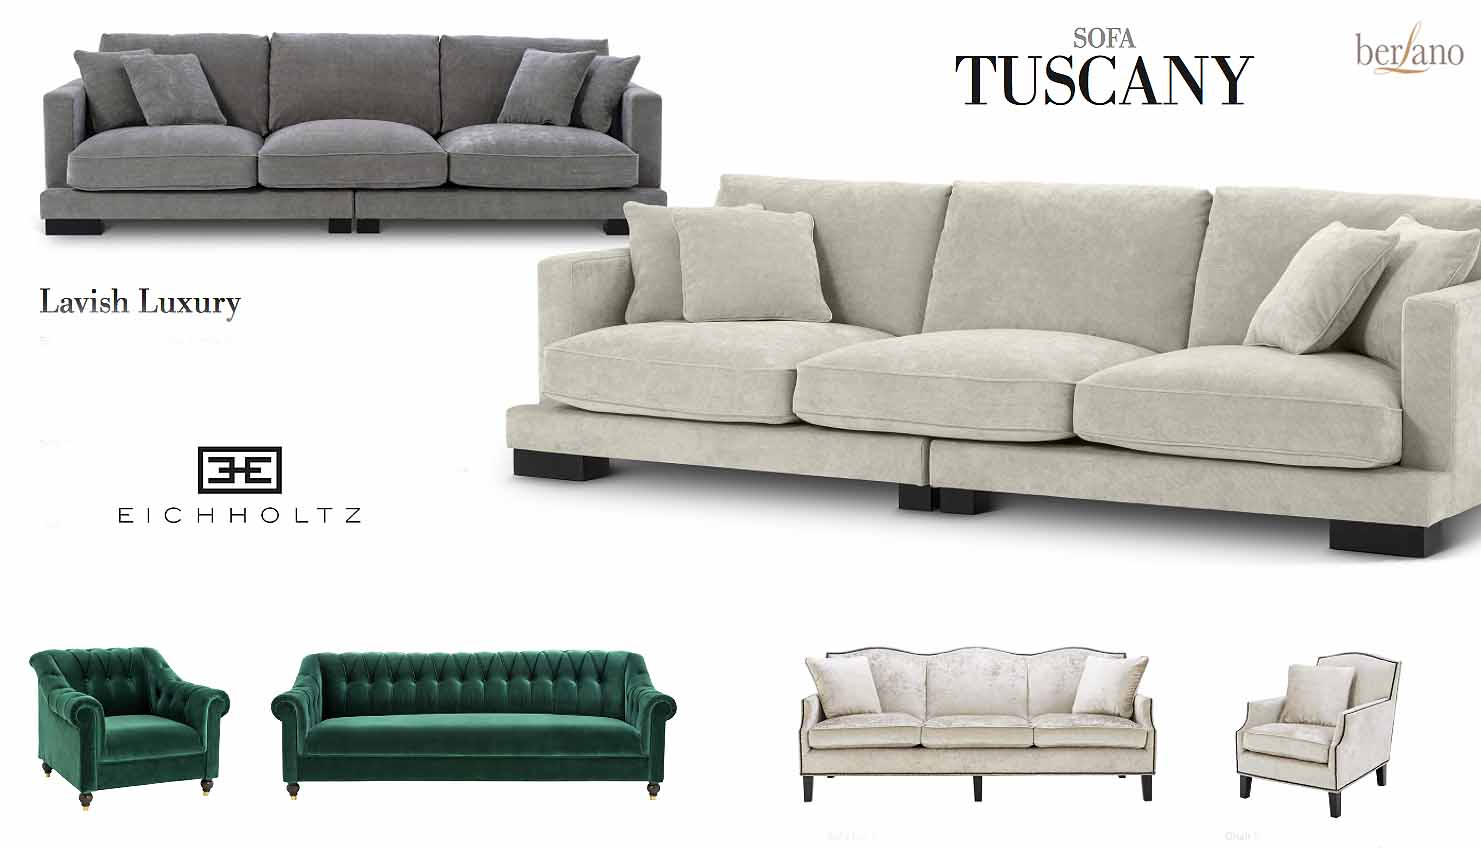 eichholtz showroom sofa TUSCANY grey